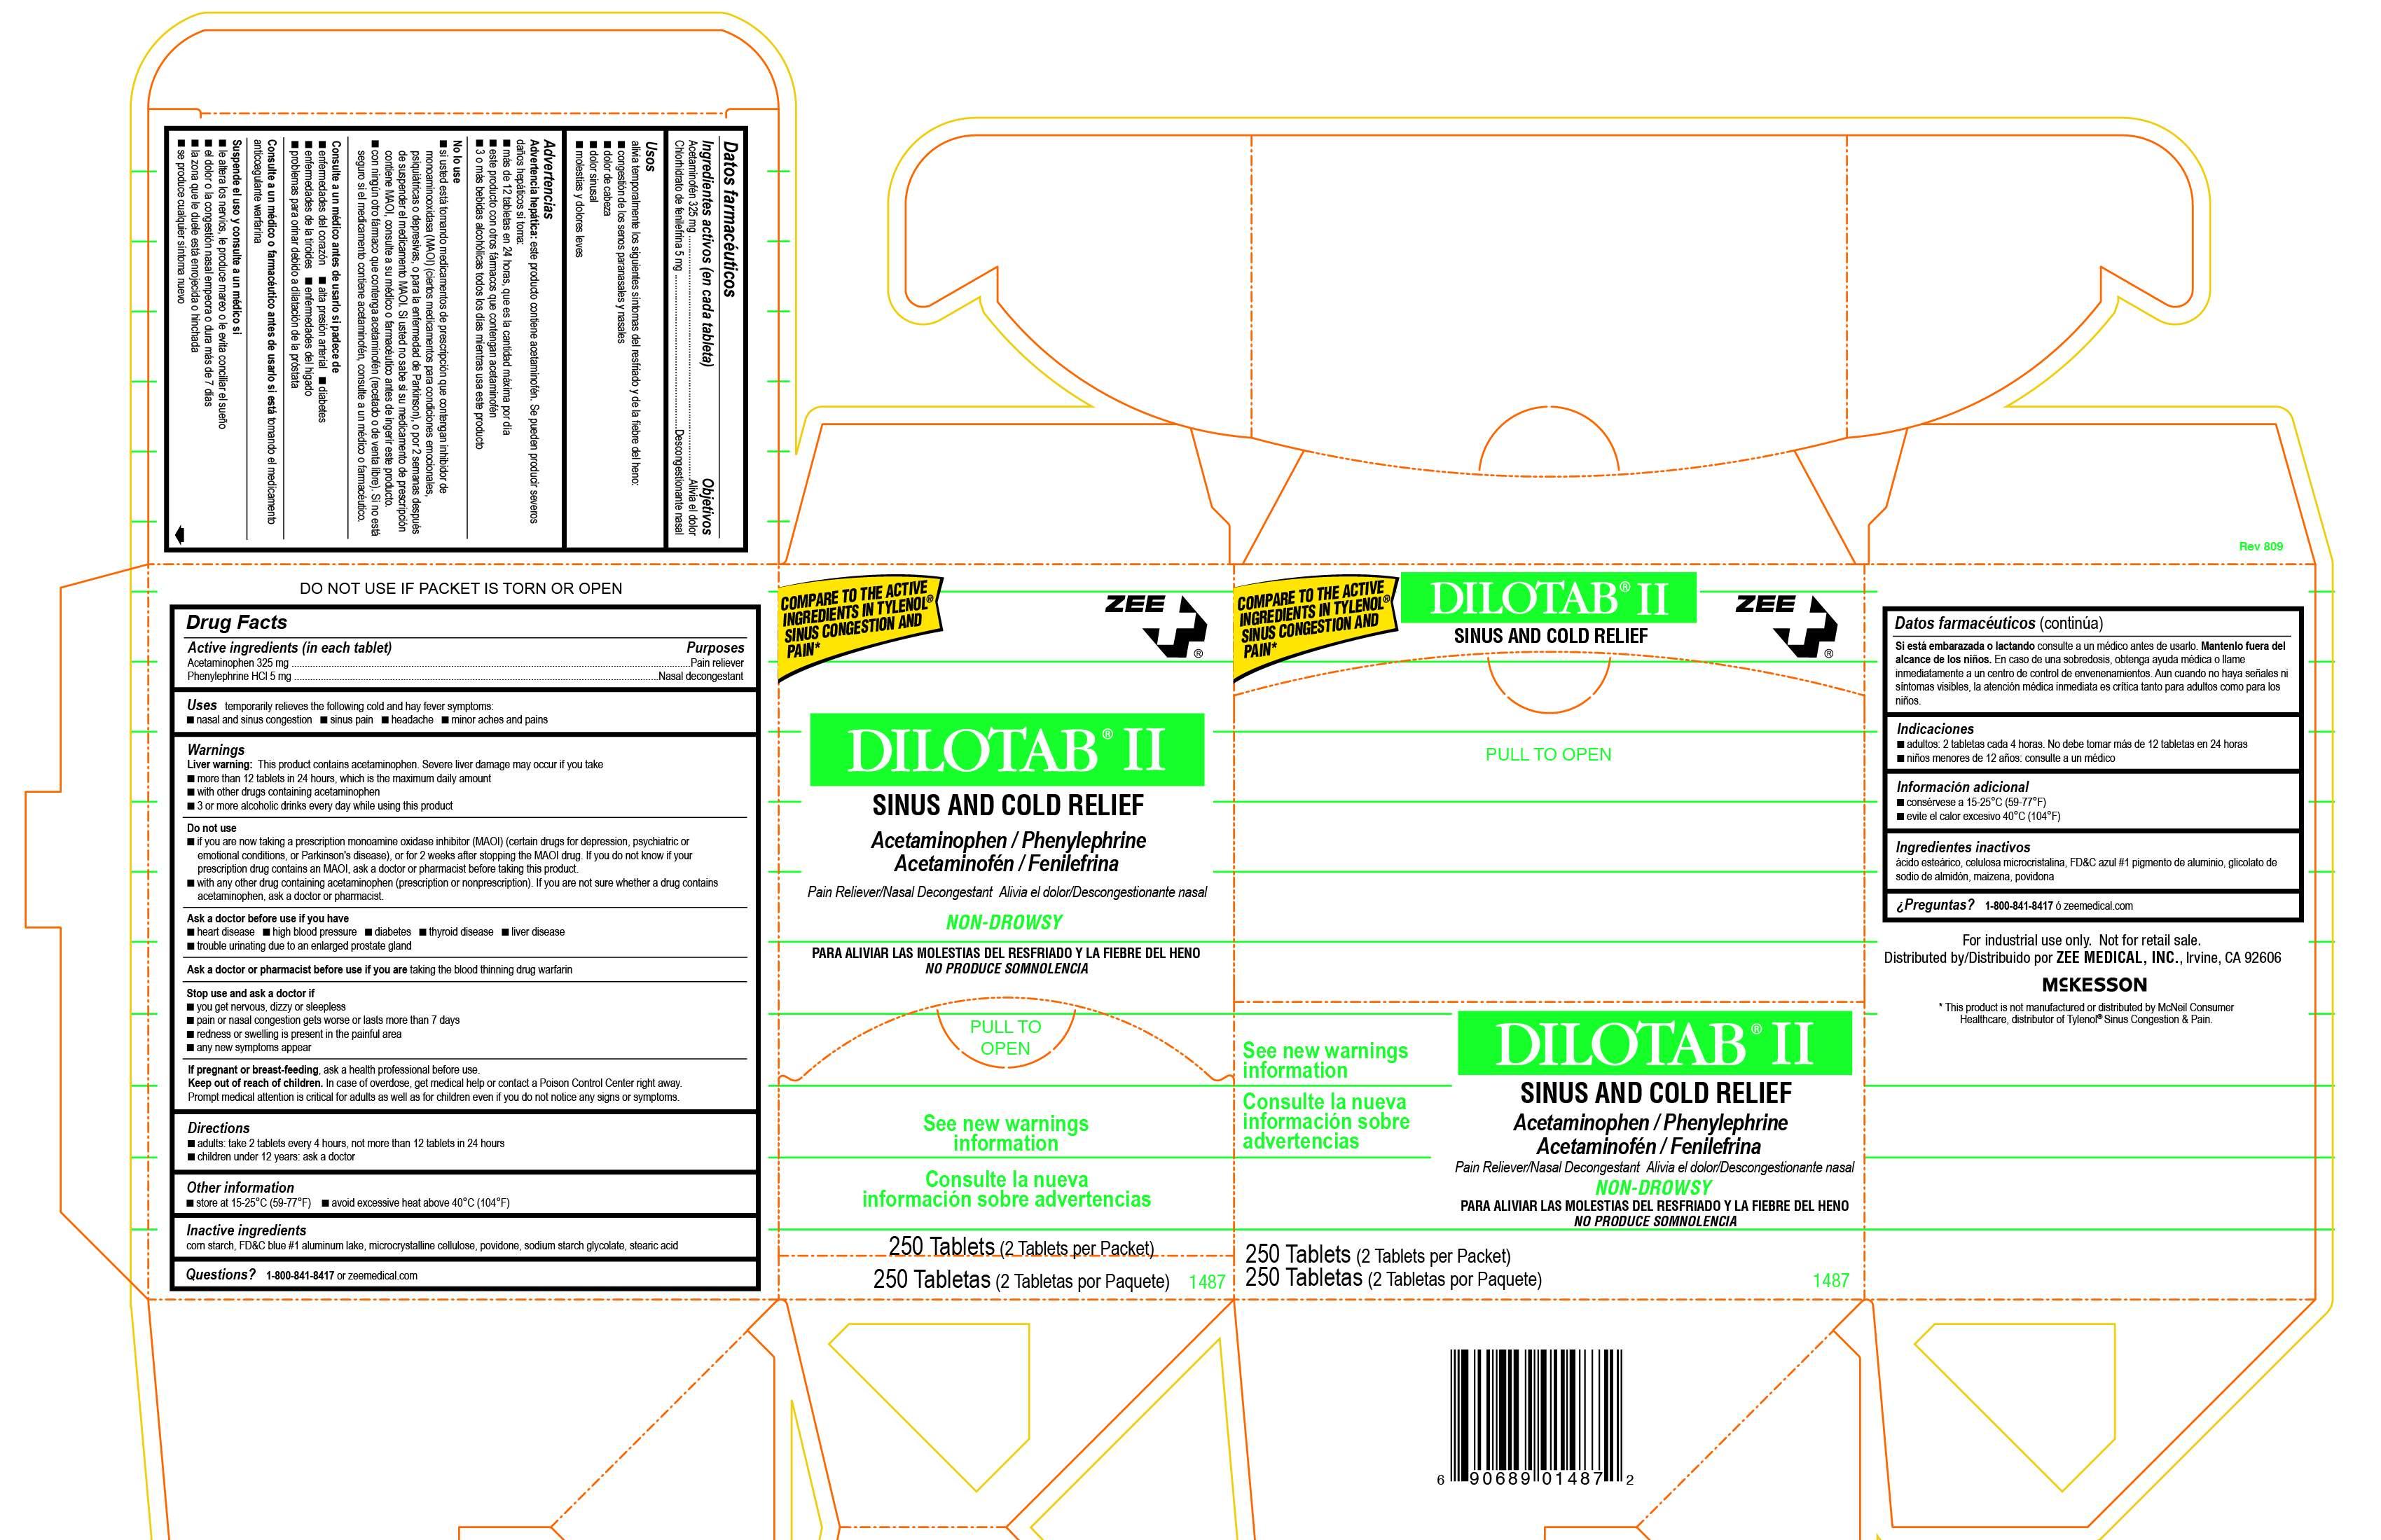 Dilotab II, 250 Box